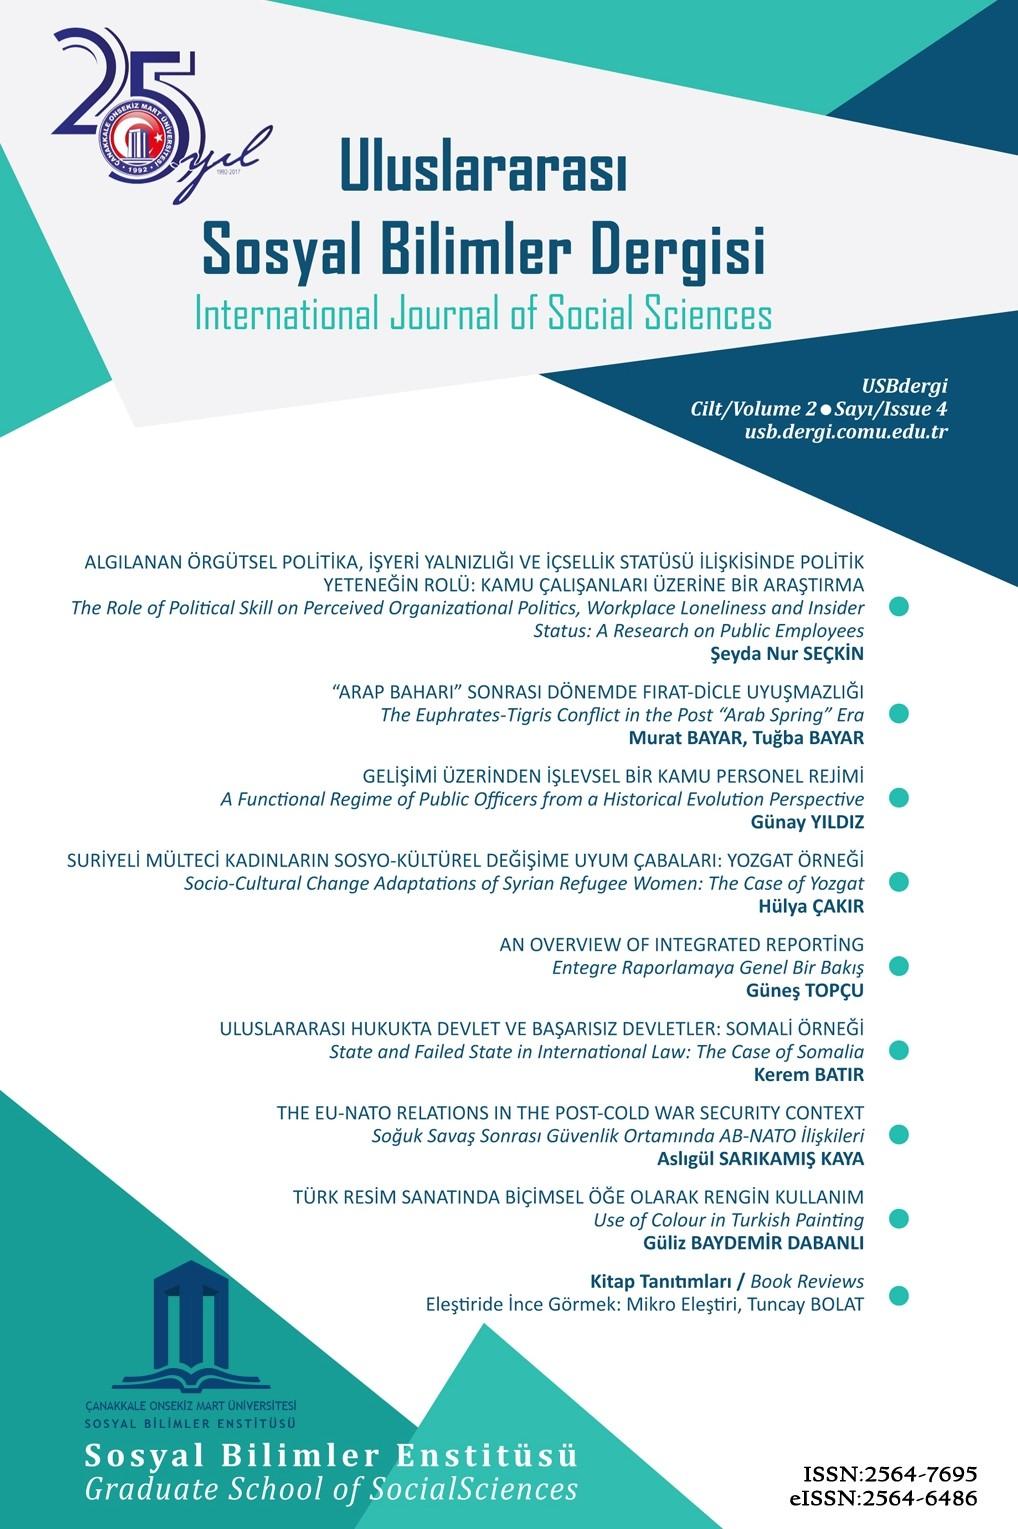 Çanakkale Onsekiz Mart University International Journal of Social Sciences